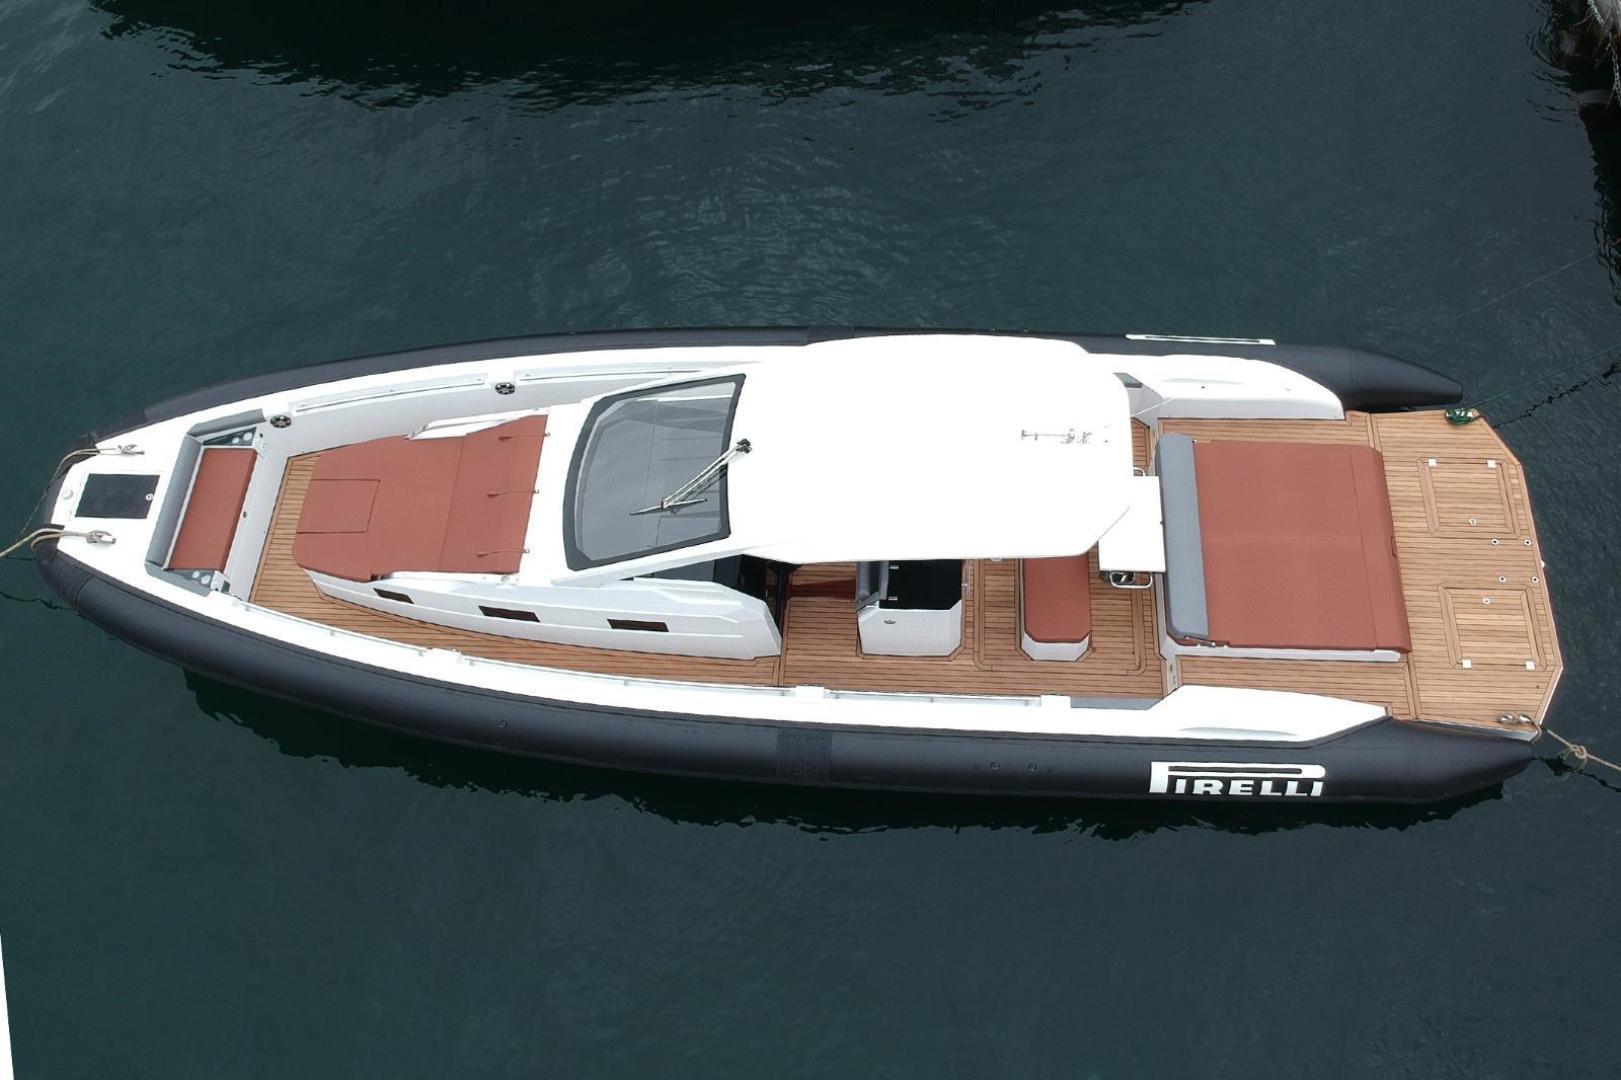 Pirelli-PZero 1250 2020-Pzero 1250 Fort Lauderdale-Florida-United States-1549624   Thumbnail